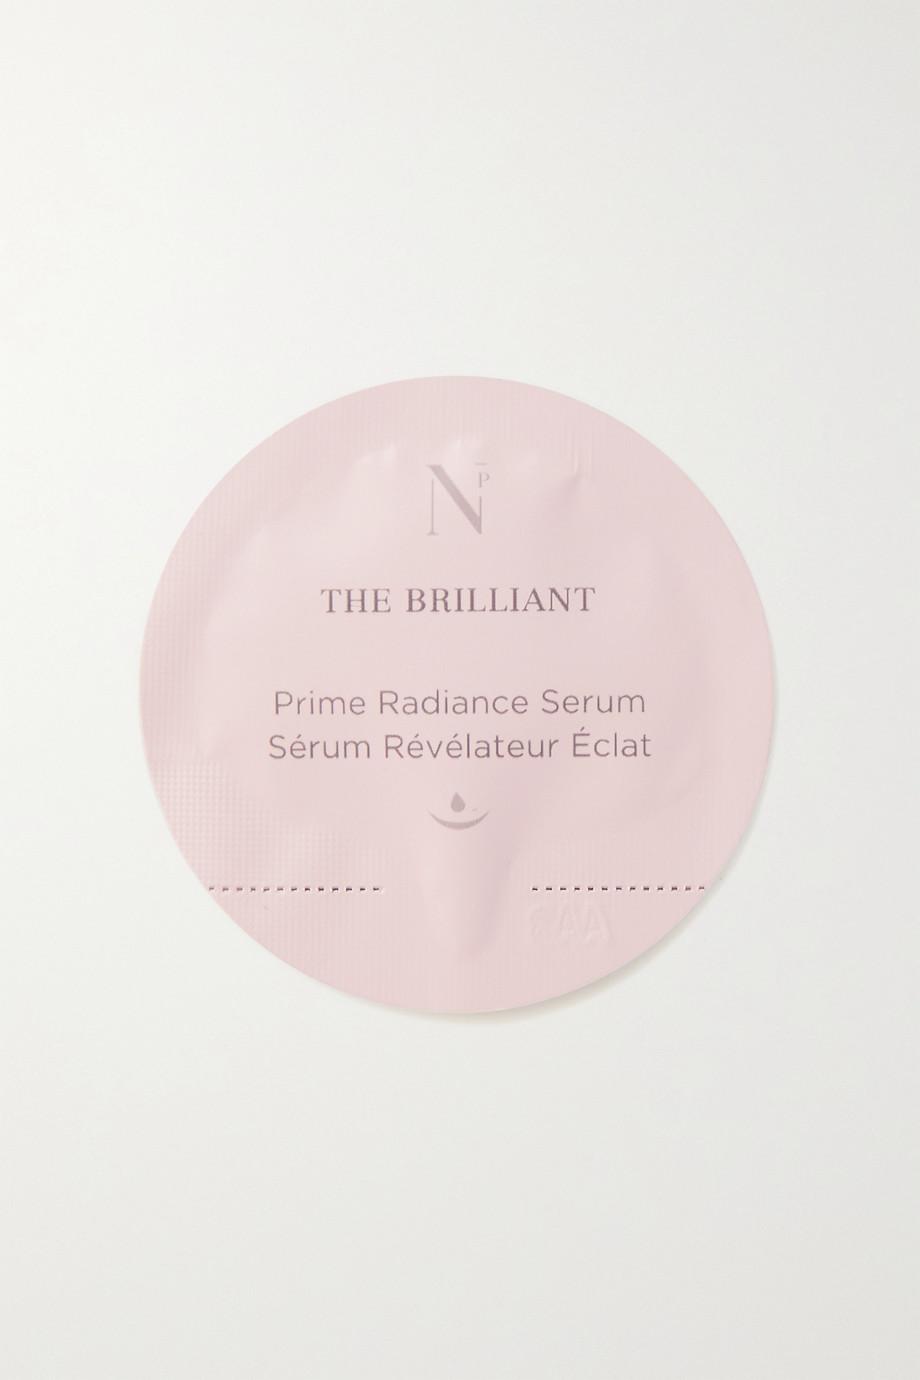 Noble Panacea The Brilliant Prime Radiance Serum Refill, 30 x 0,5 ml – Nachfüll-Serum